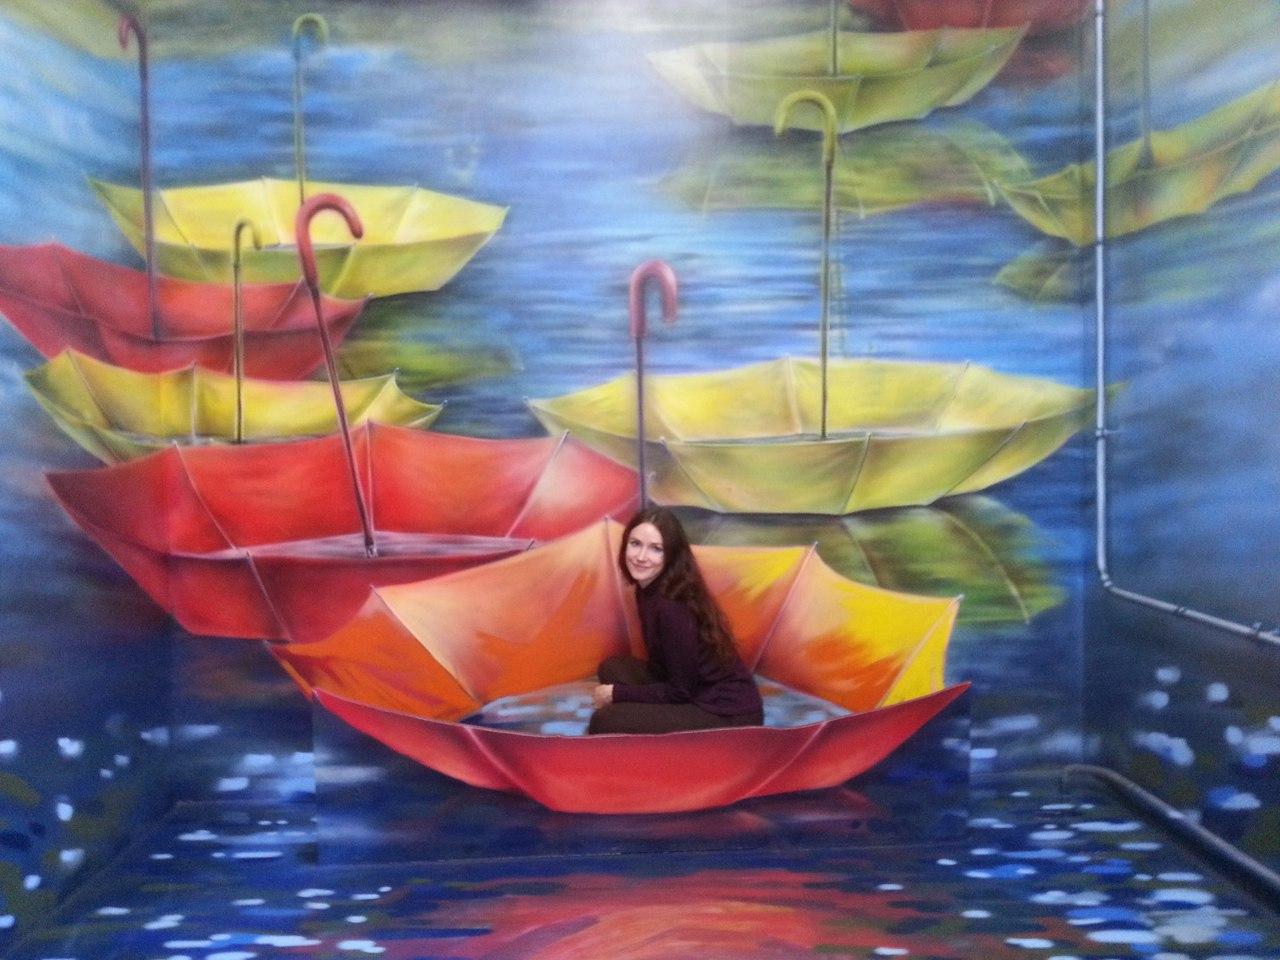 Оксана Кононенко, Санкт-Петербург - фото №4